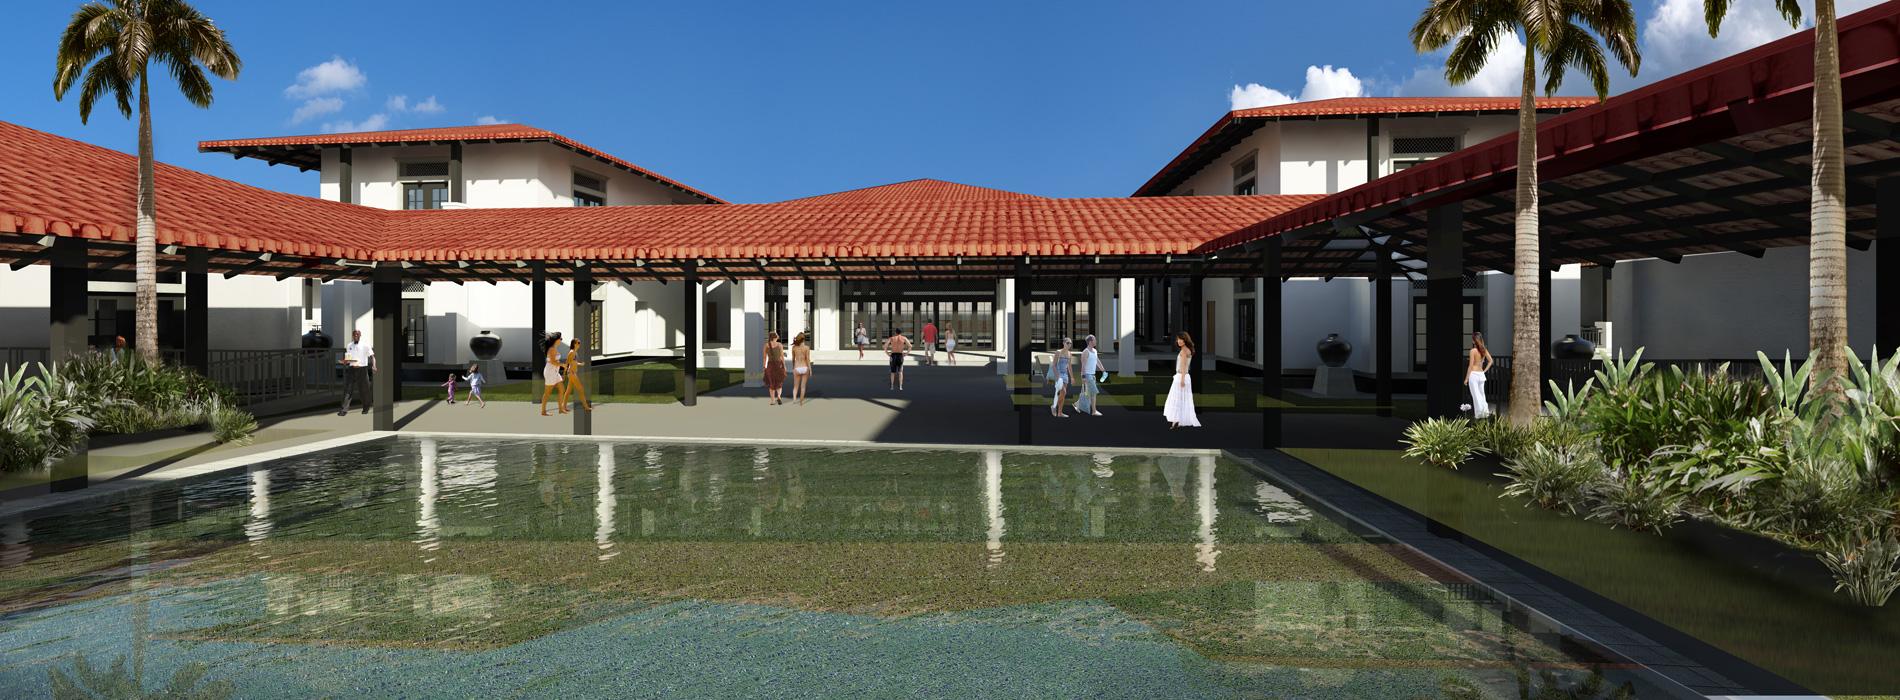 Lubi Island Plantation and Resort